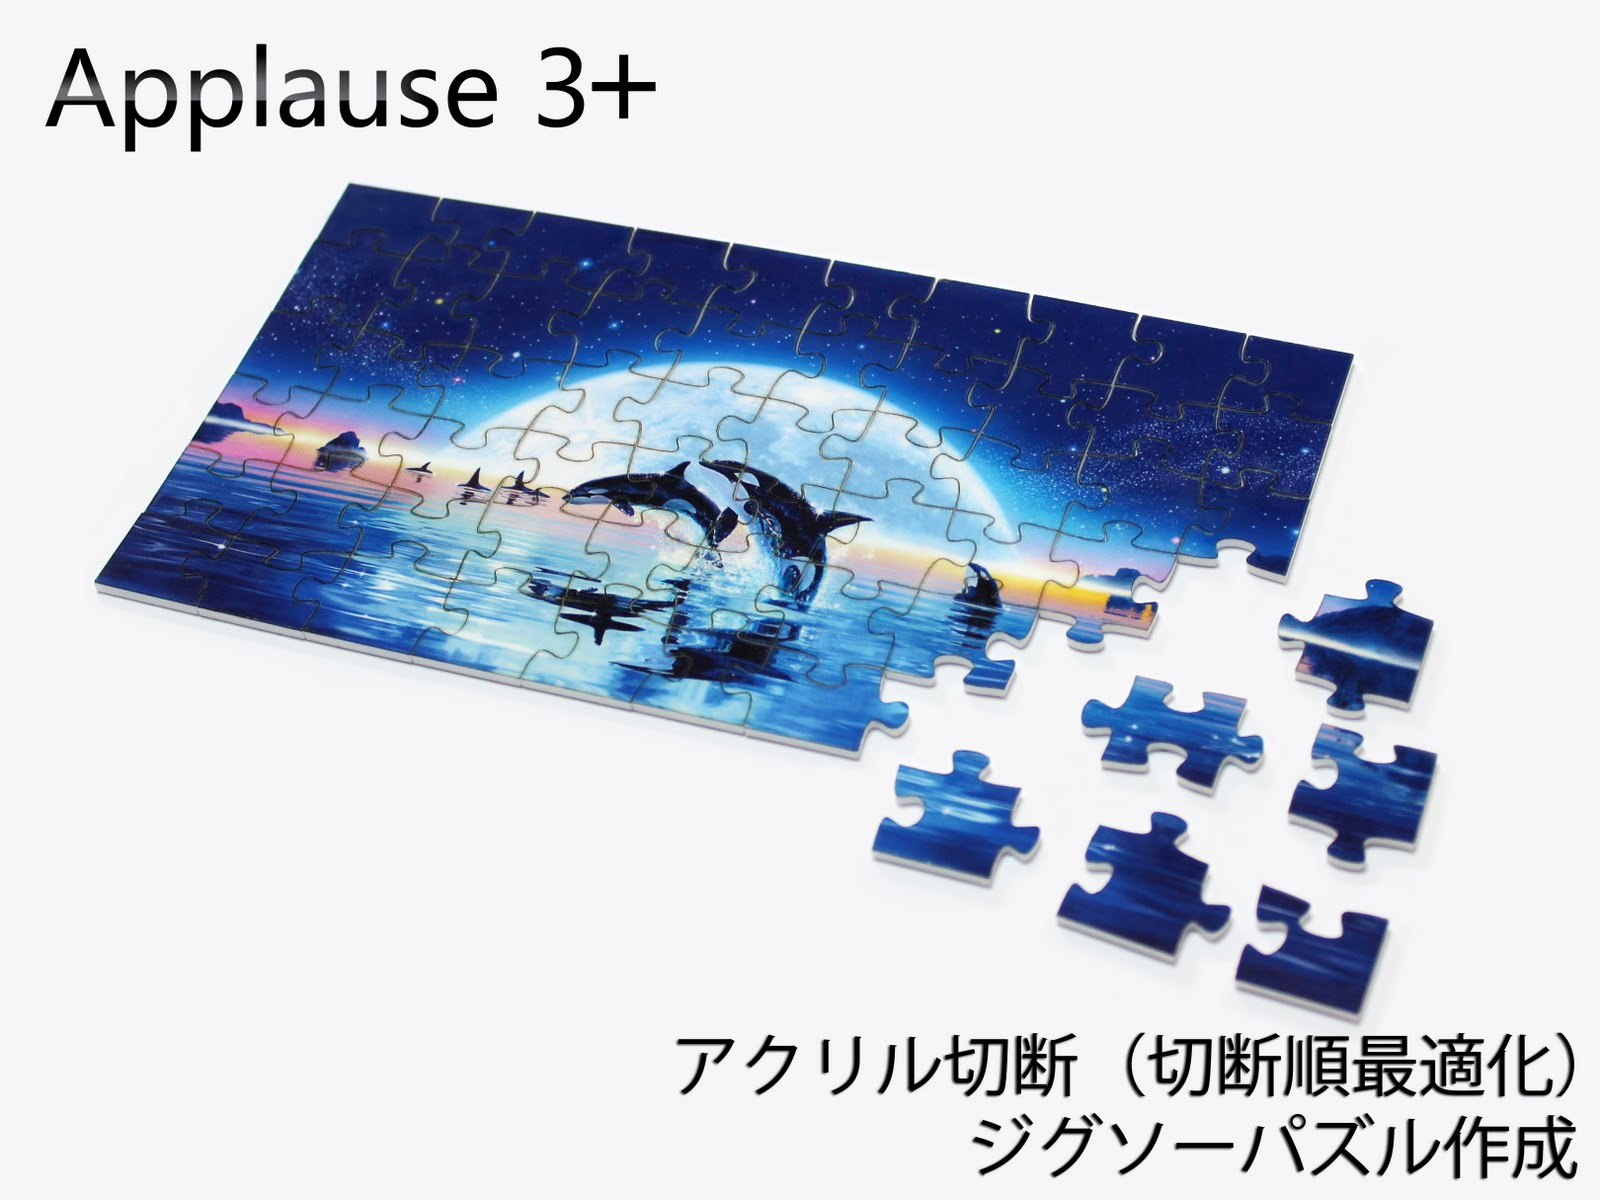 Applause 3+レーザー加工機:ジグソーパズル加工写真